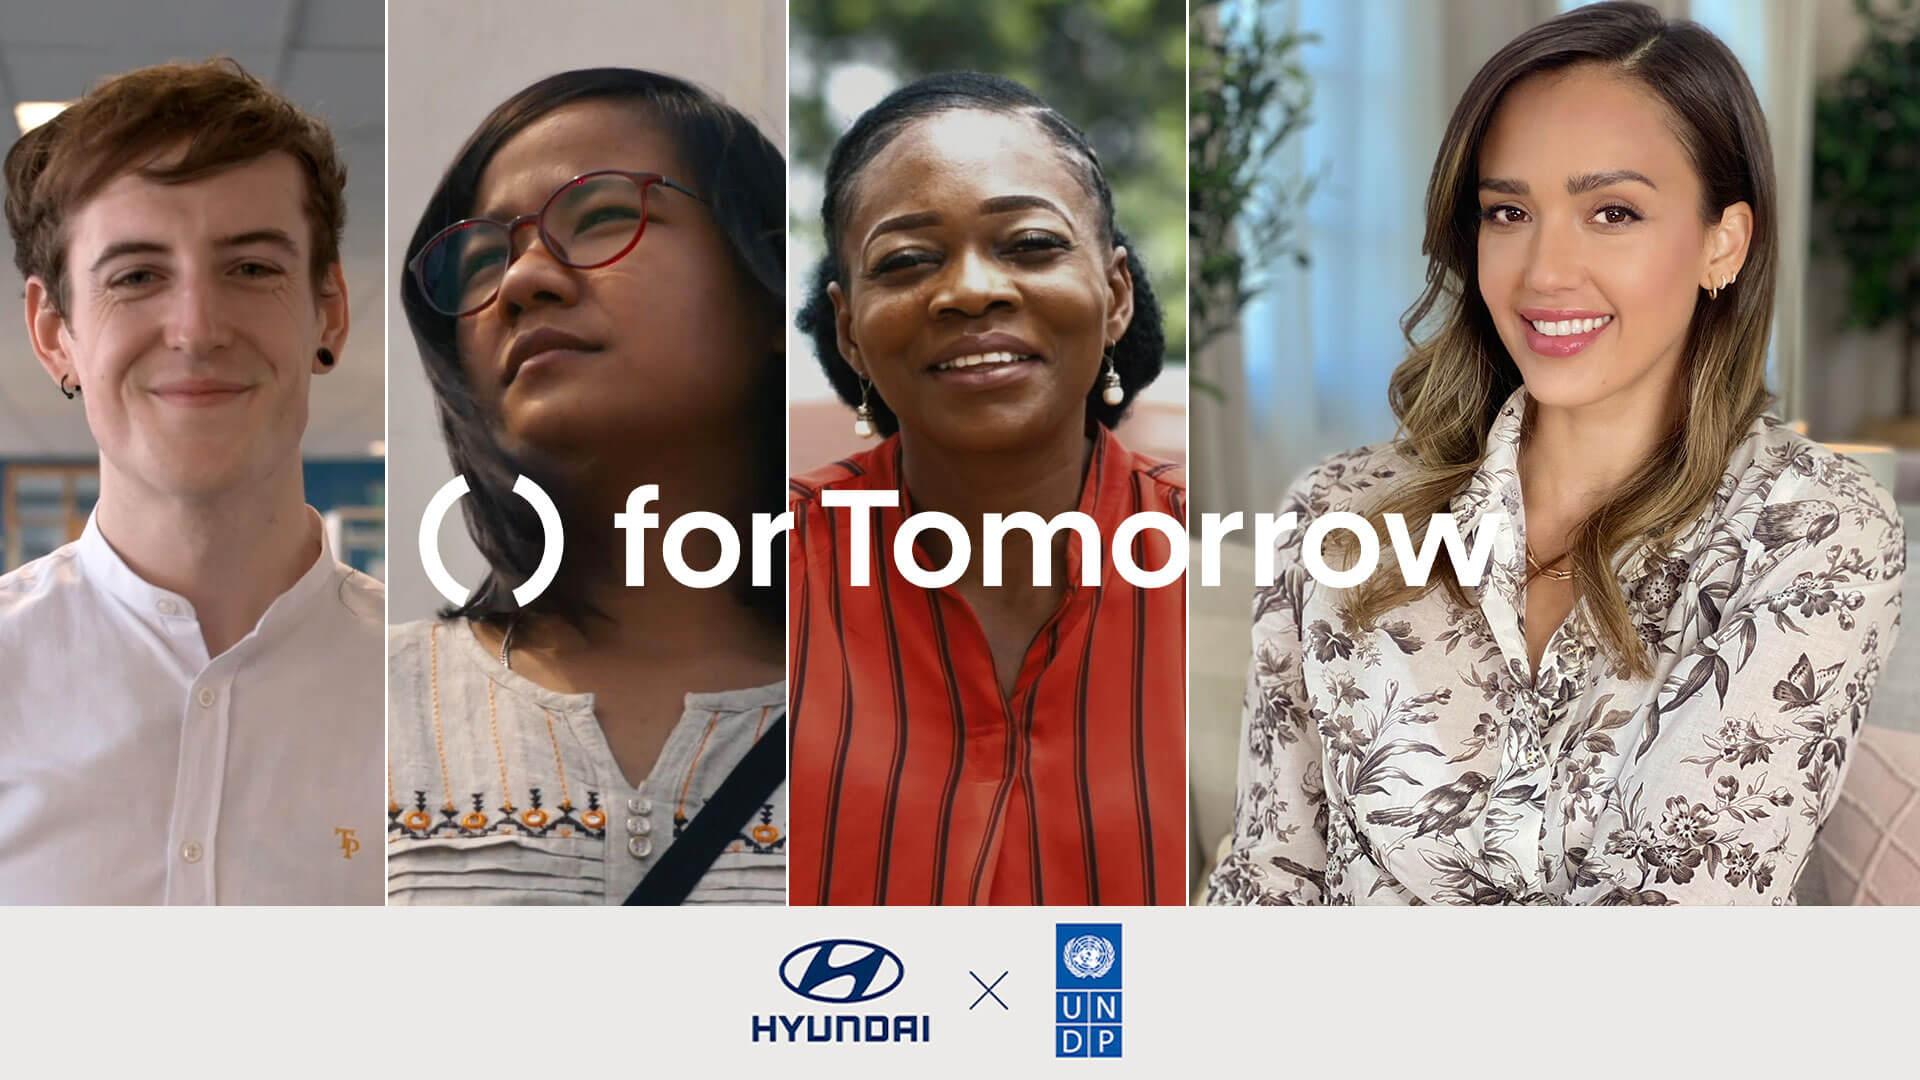 Hyundai for tomorrow images avec 4 personnes